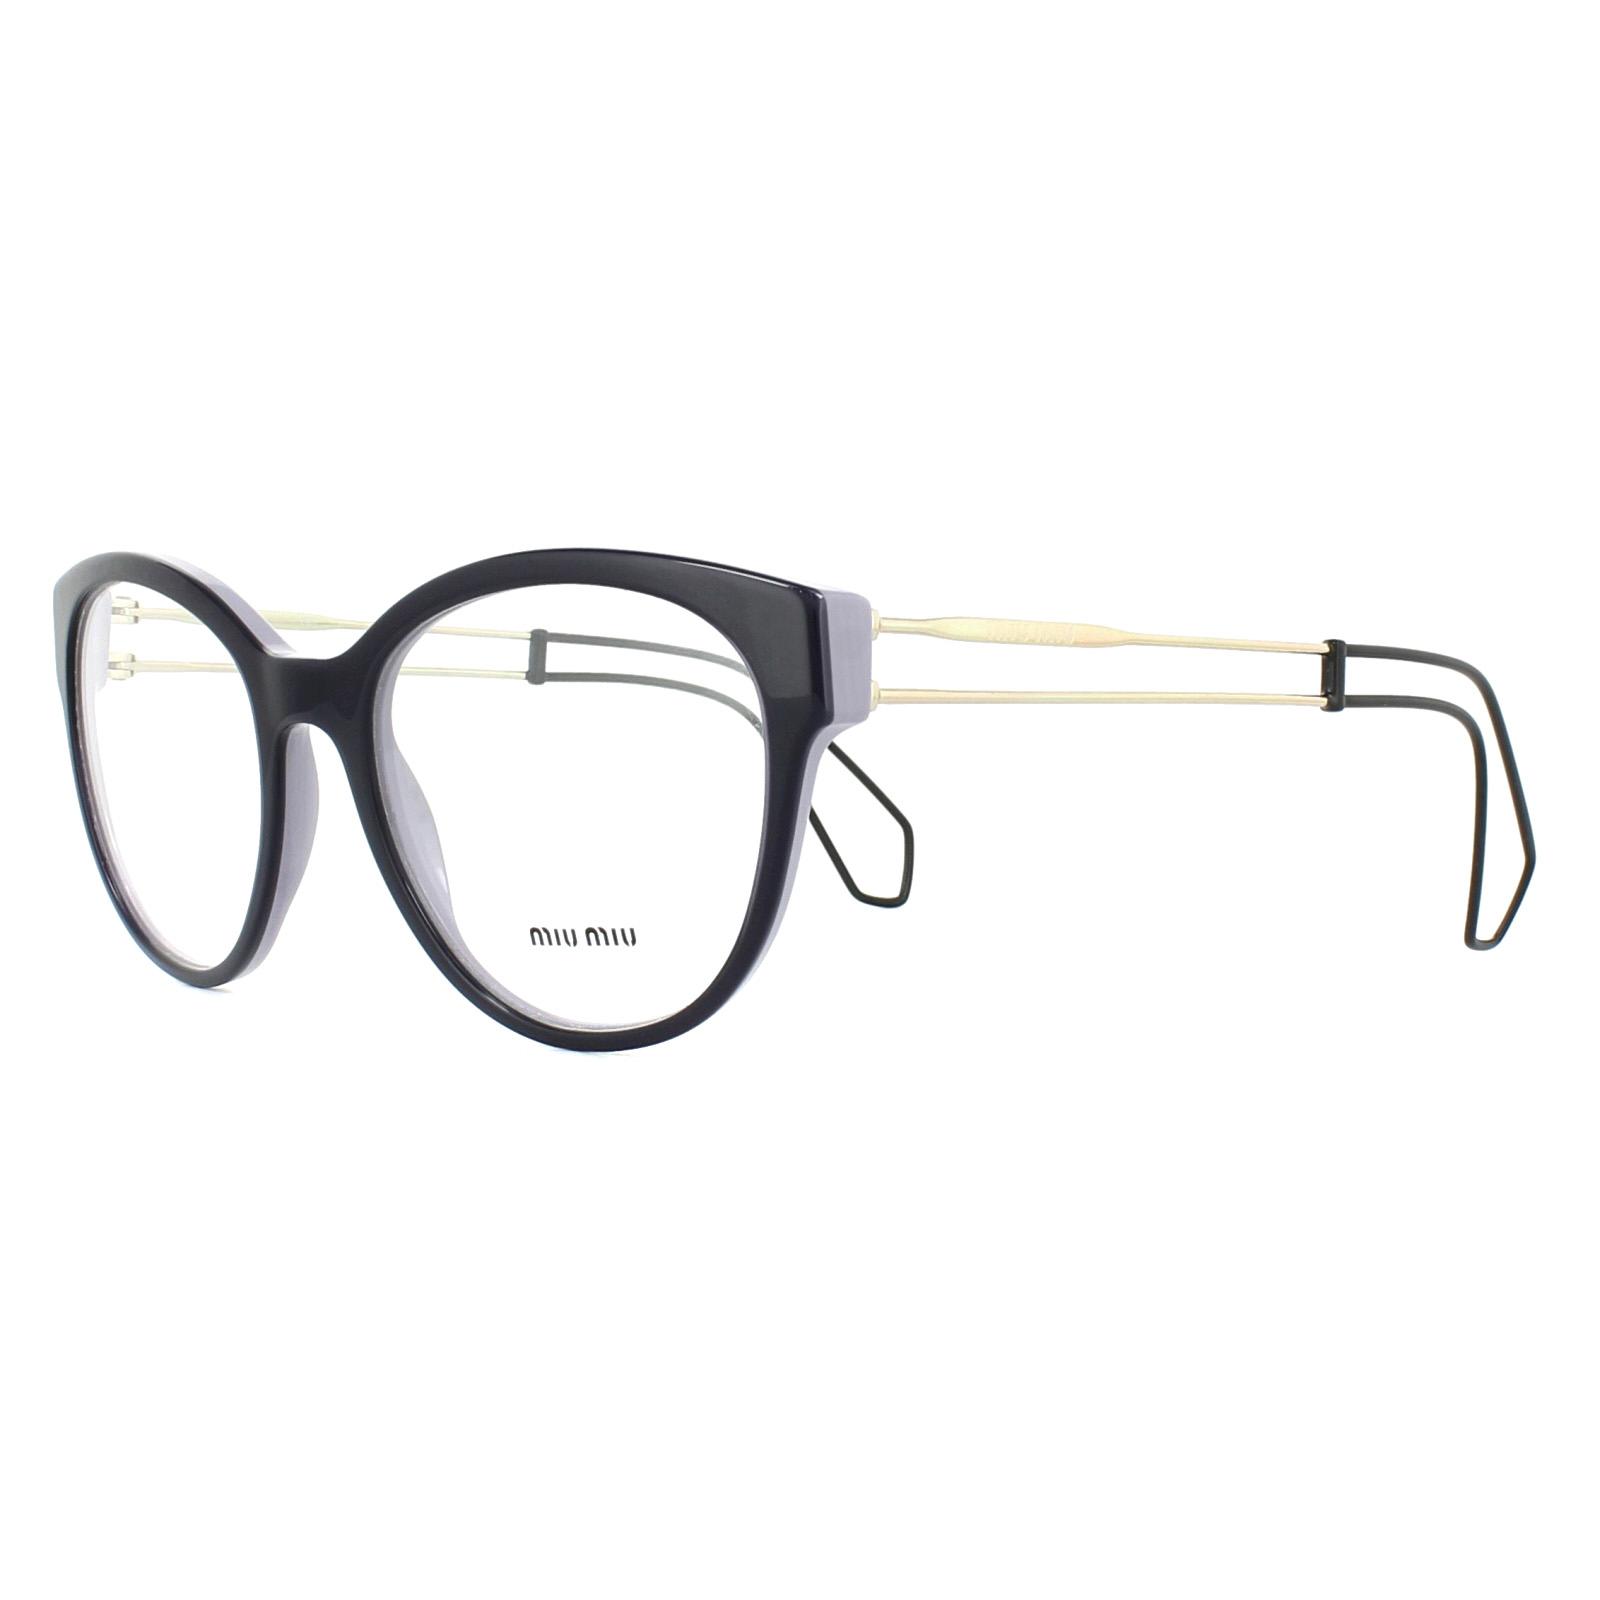 d80fc80a7ef Details about Miu Miu Glasses Frames MU03PV USN1O1 Lilac Top Violet 54mm  Womens